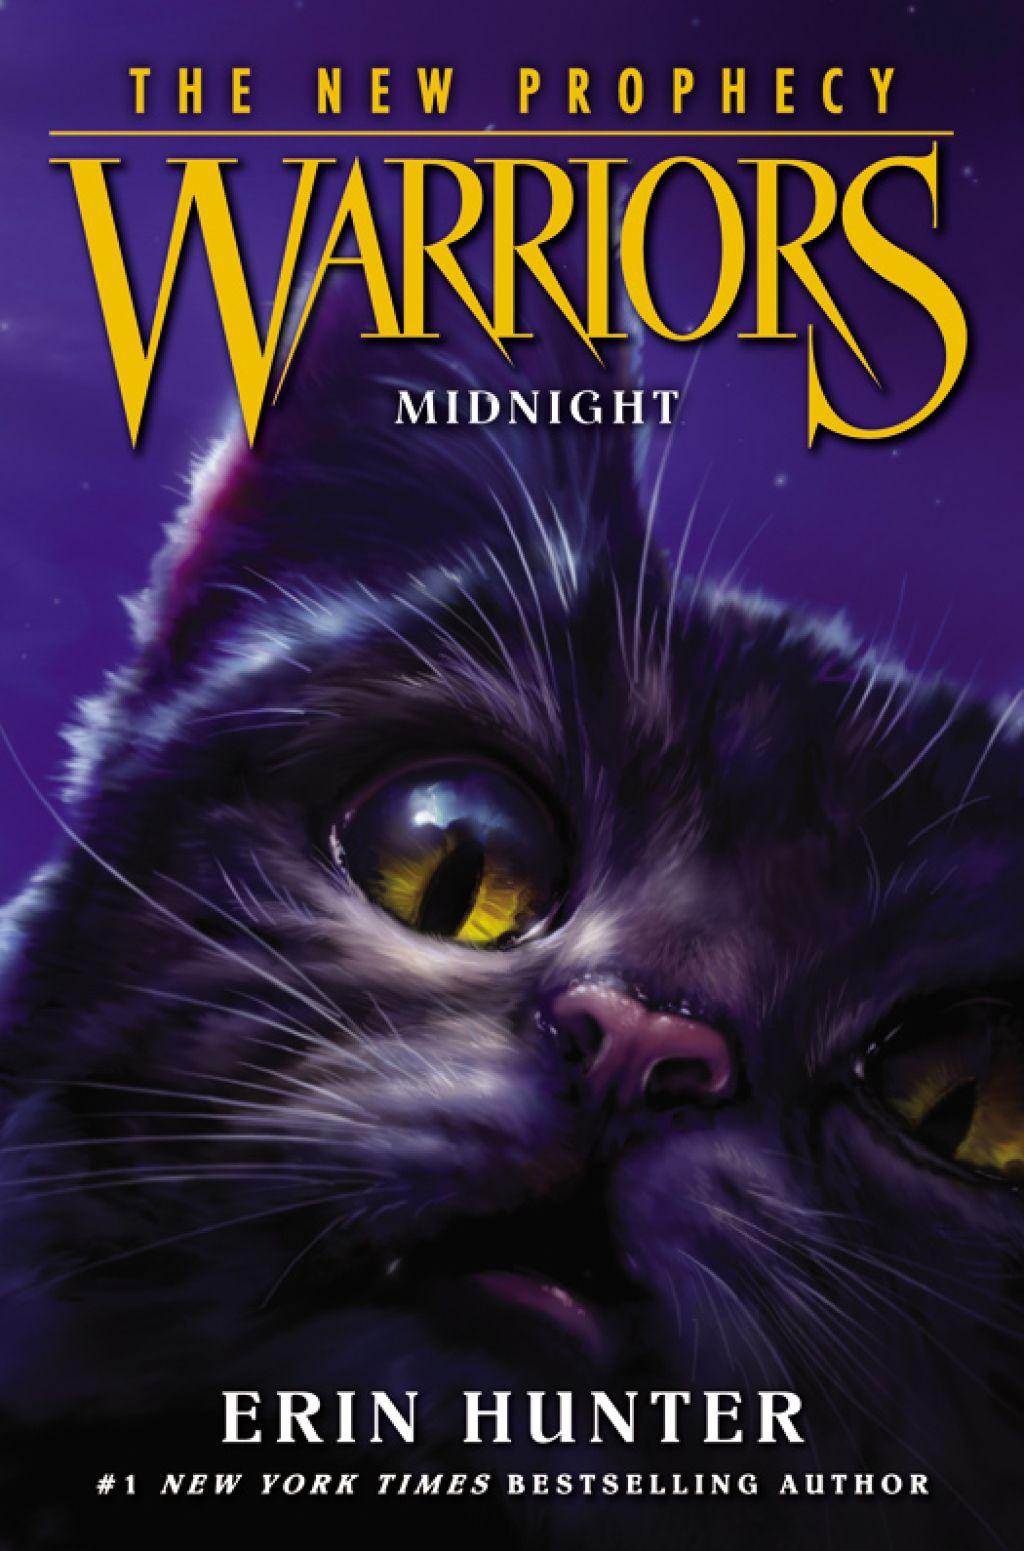 Warriors The New Prophecy 1 Midnight (eBook) Warrior